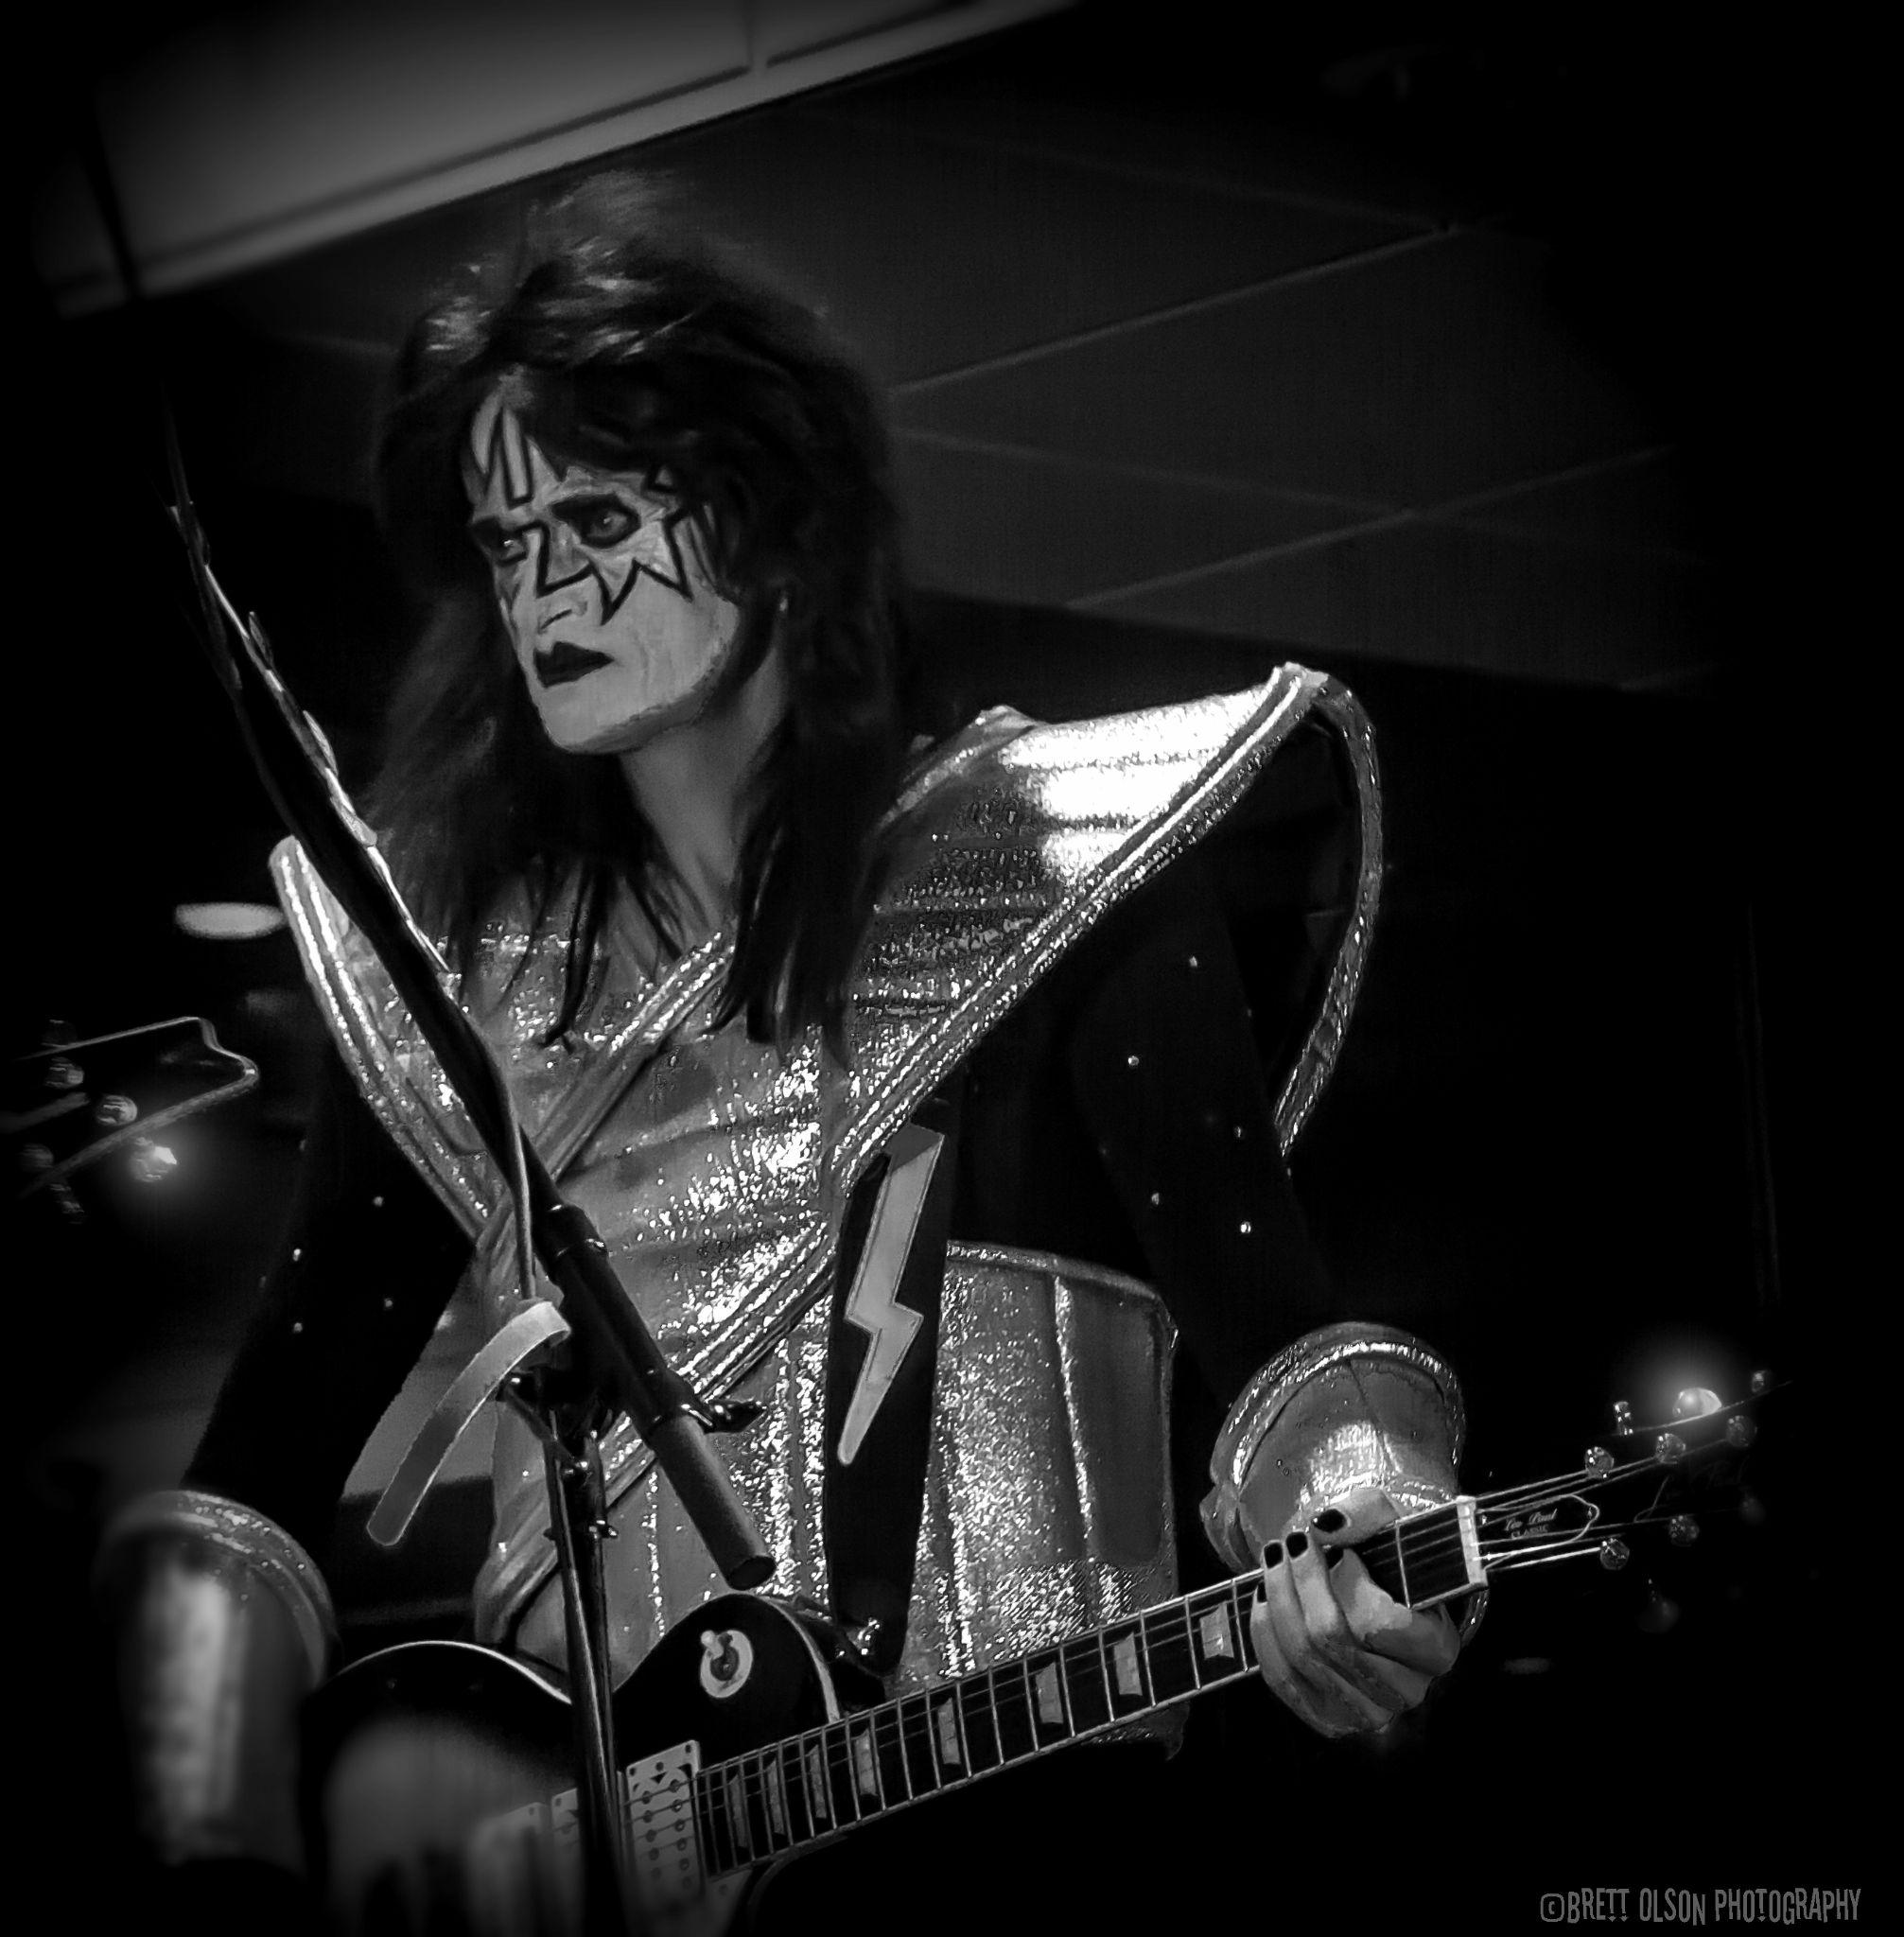 Rock n Roll by Brett Olson